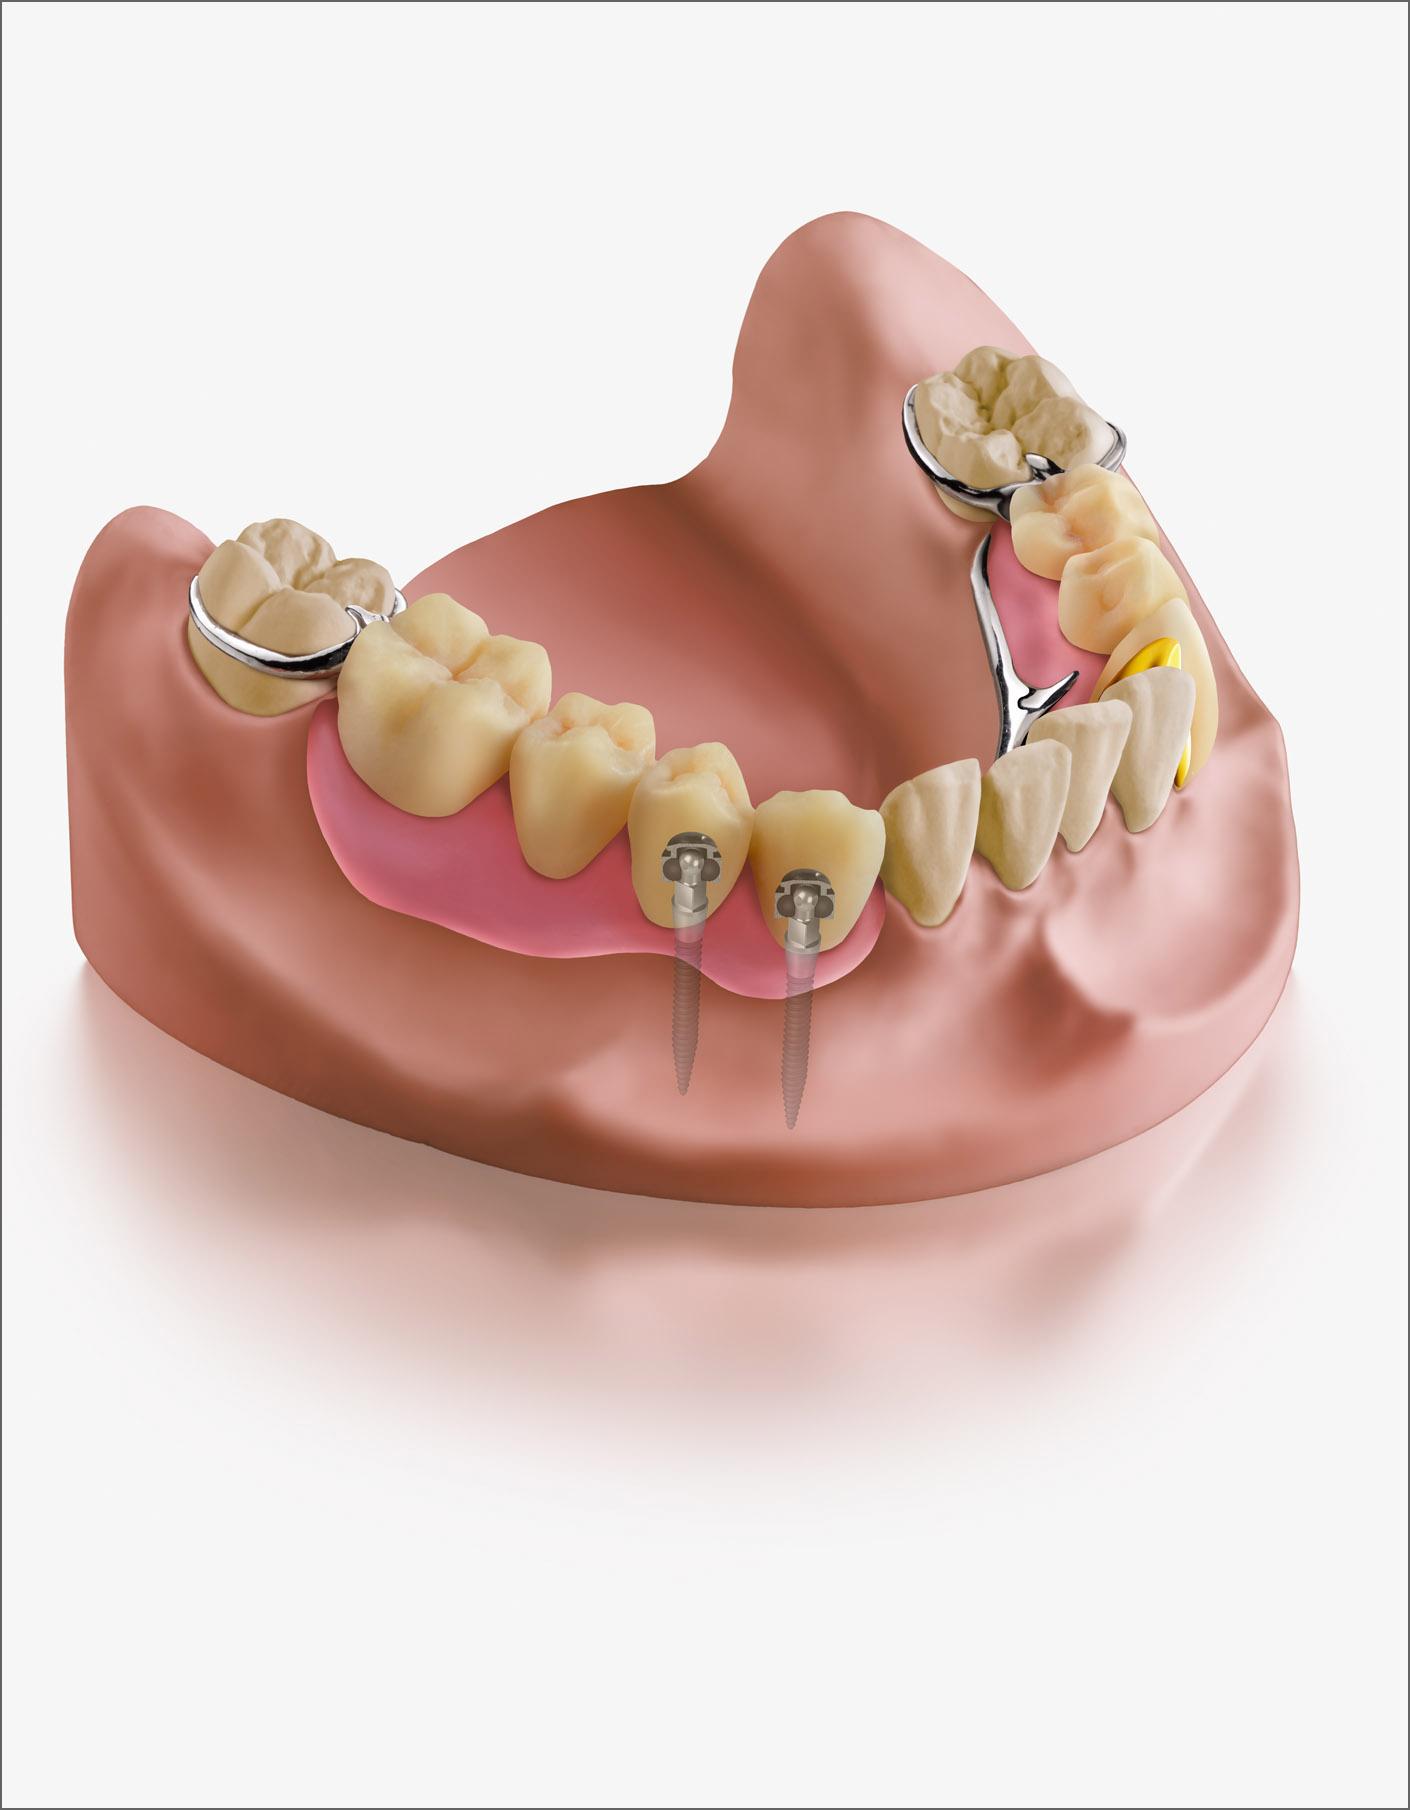 portfolio_dental_illustration_1410x1810